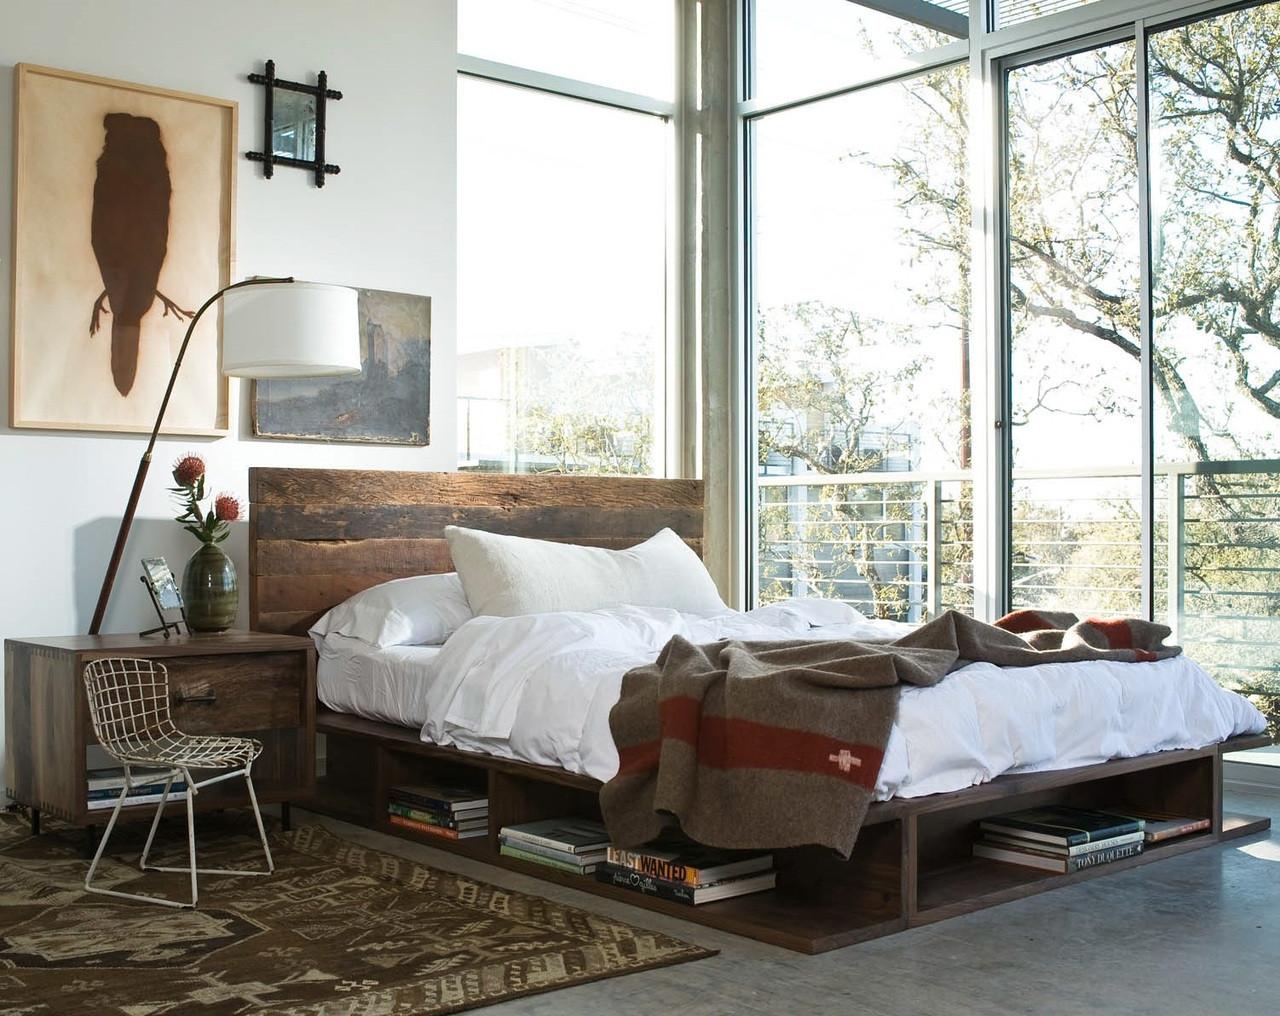 ... Bina Bonnie King Bed- Rustic Reclaimed Wood Platform Bed Frame ... - Bonnie Rustic Reclaimed Wood King Platform Bed Frame Zin Home